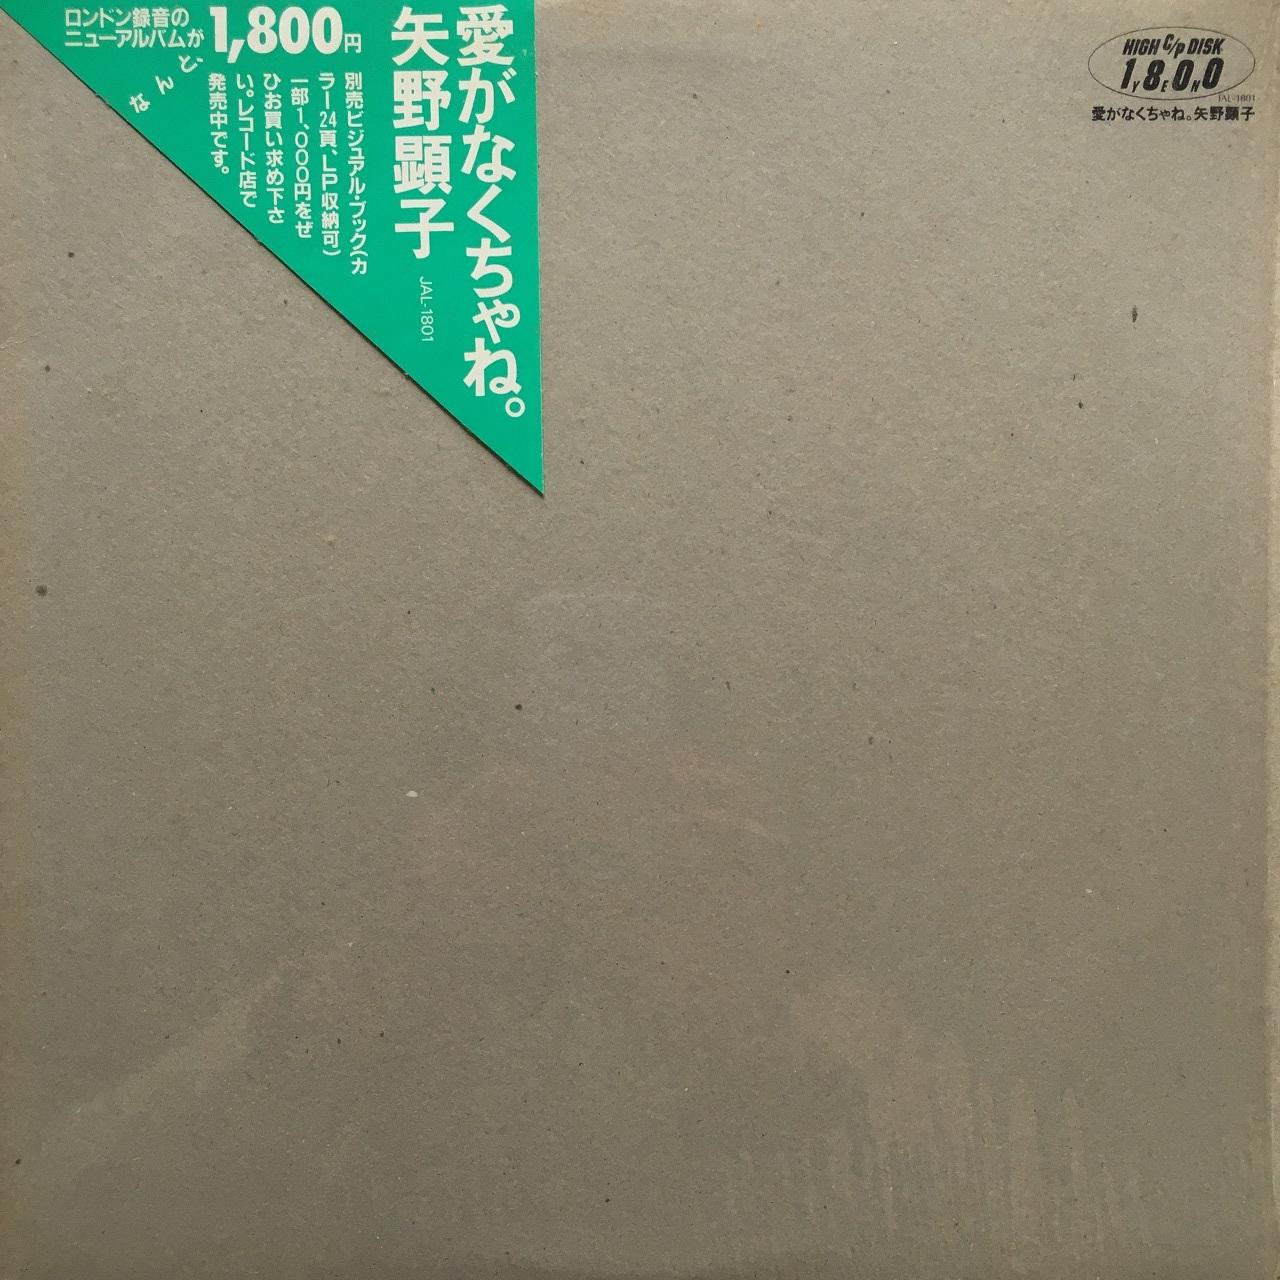 【LP・国内盤】矢野顕子 / 愛がなくちゃね。